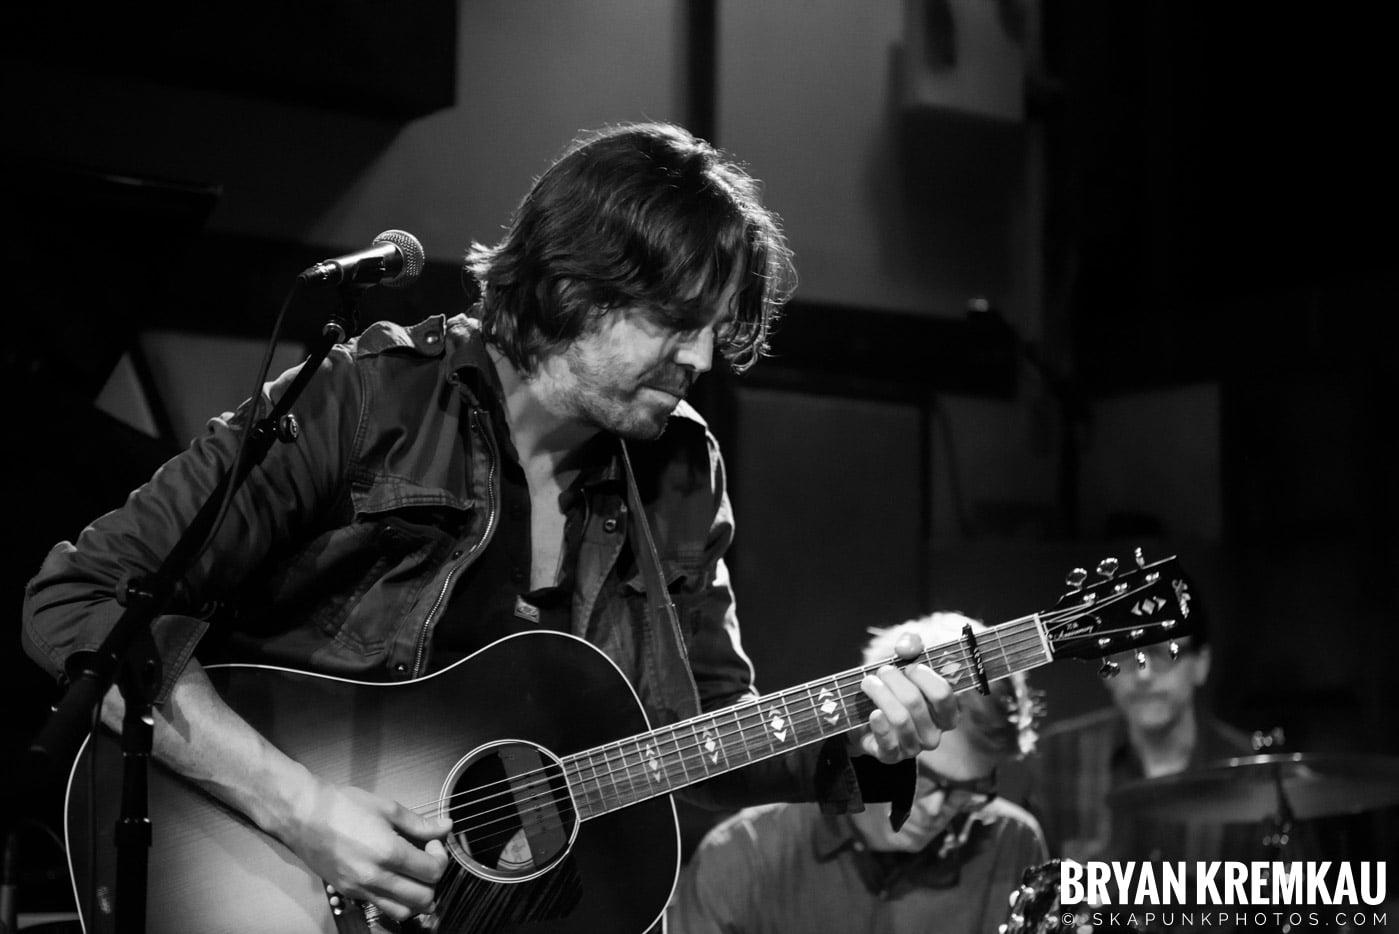 Peter Bradley Adams @ Rockwood Music Hall, NYC - 3.9.13 (4)